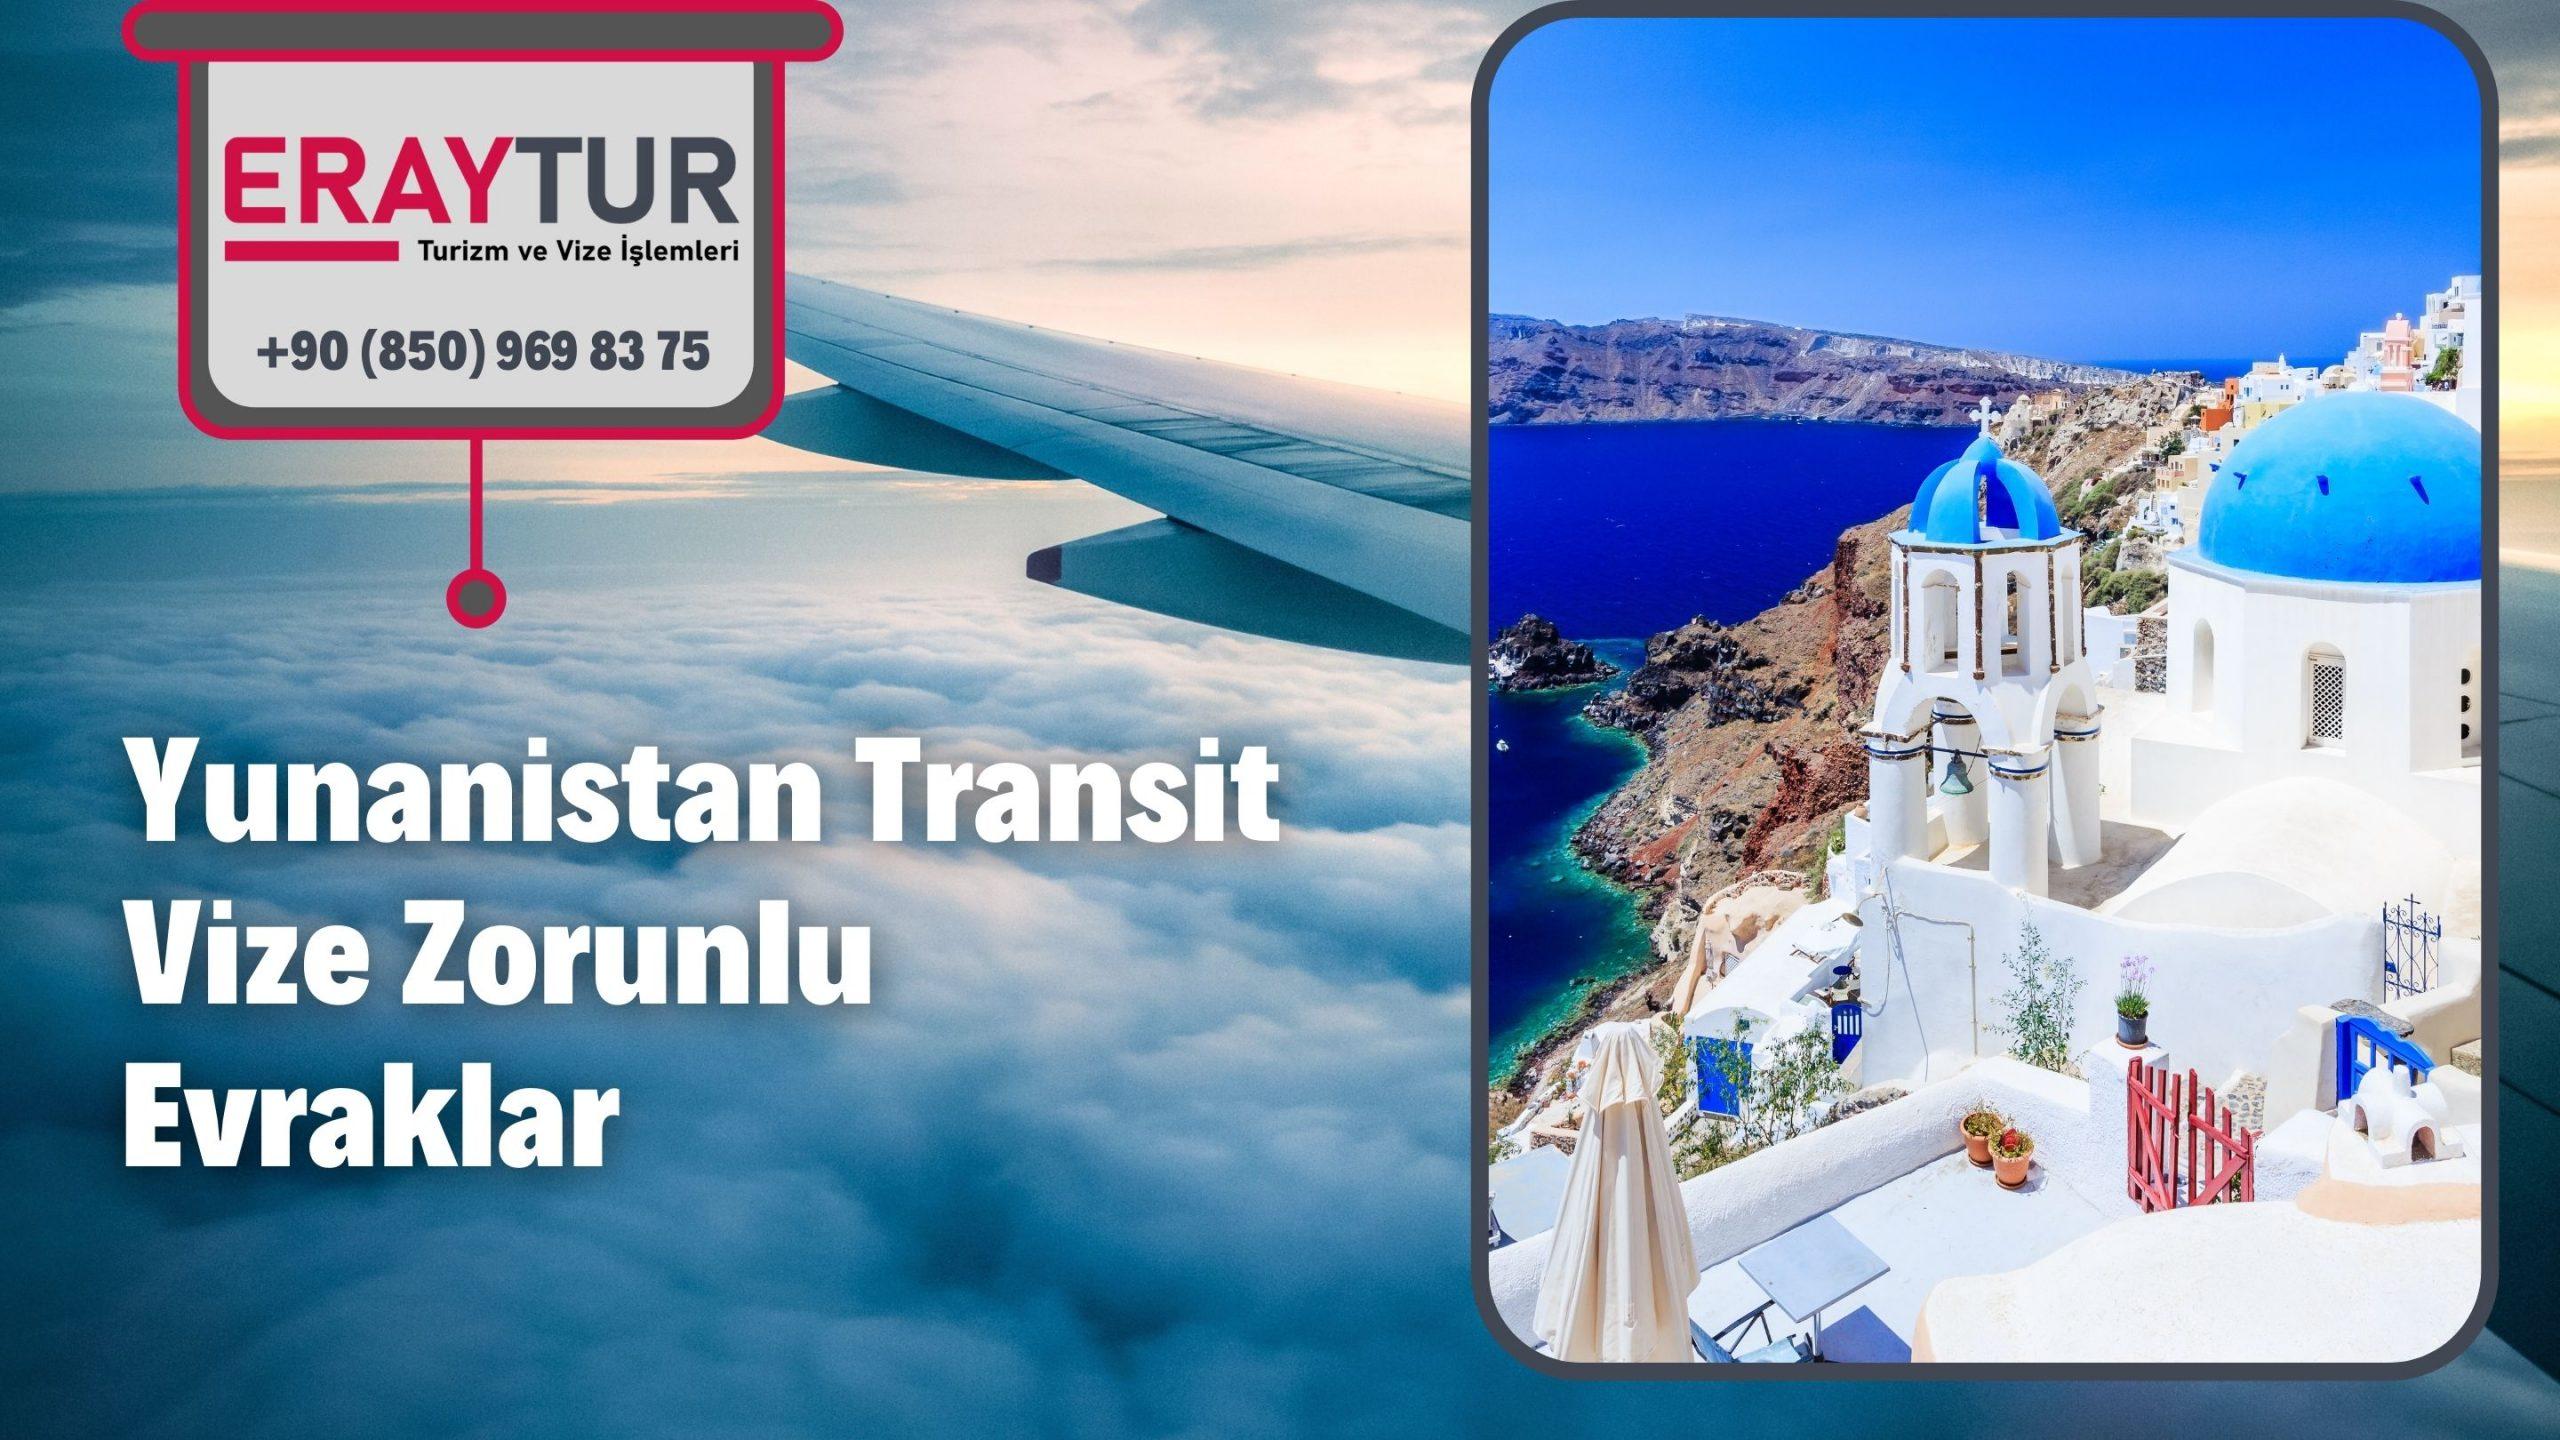 Yunanistan Transit Vize Zorunlu Evraklar